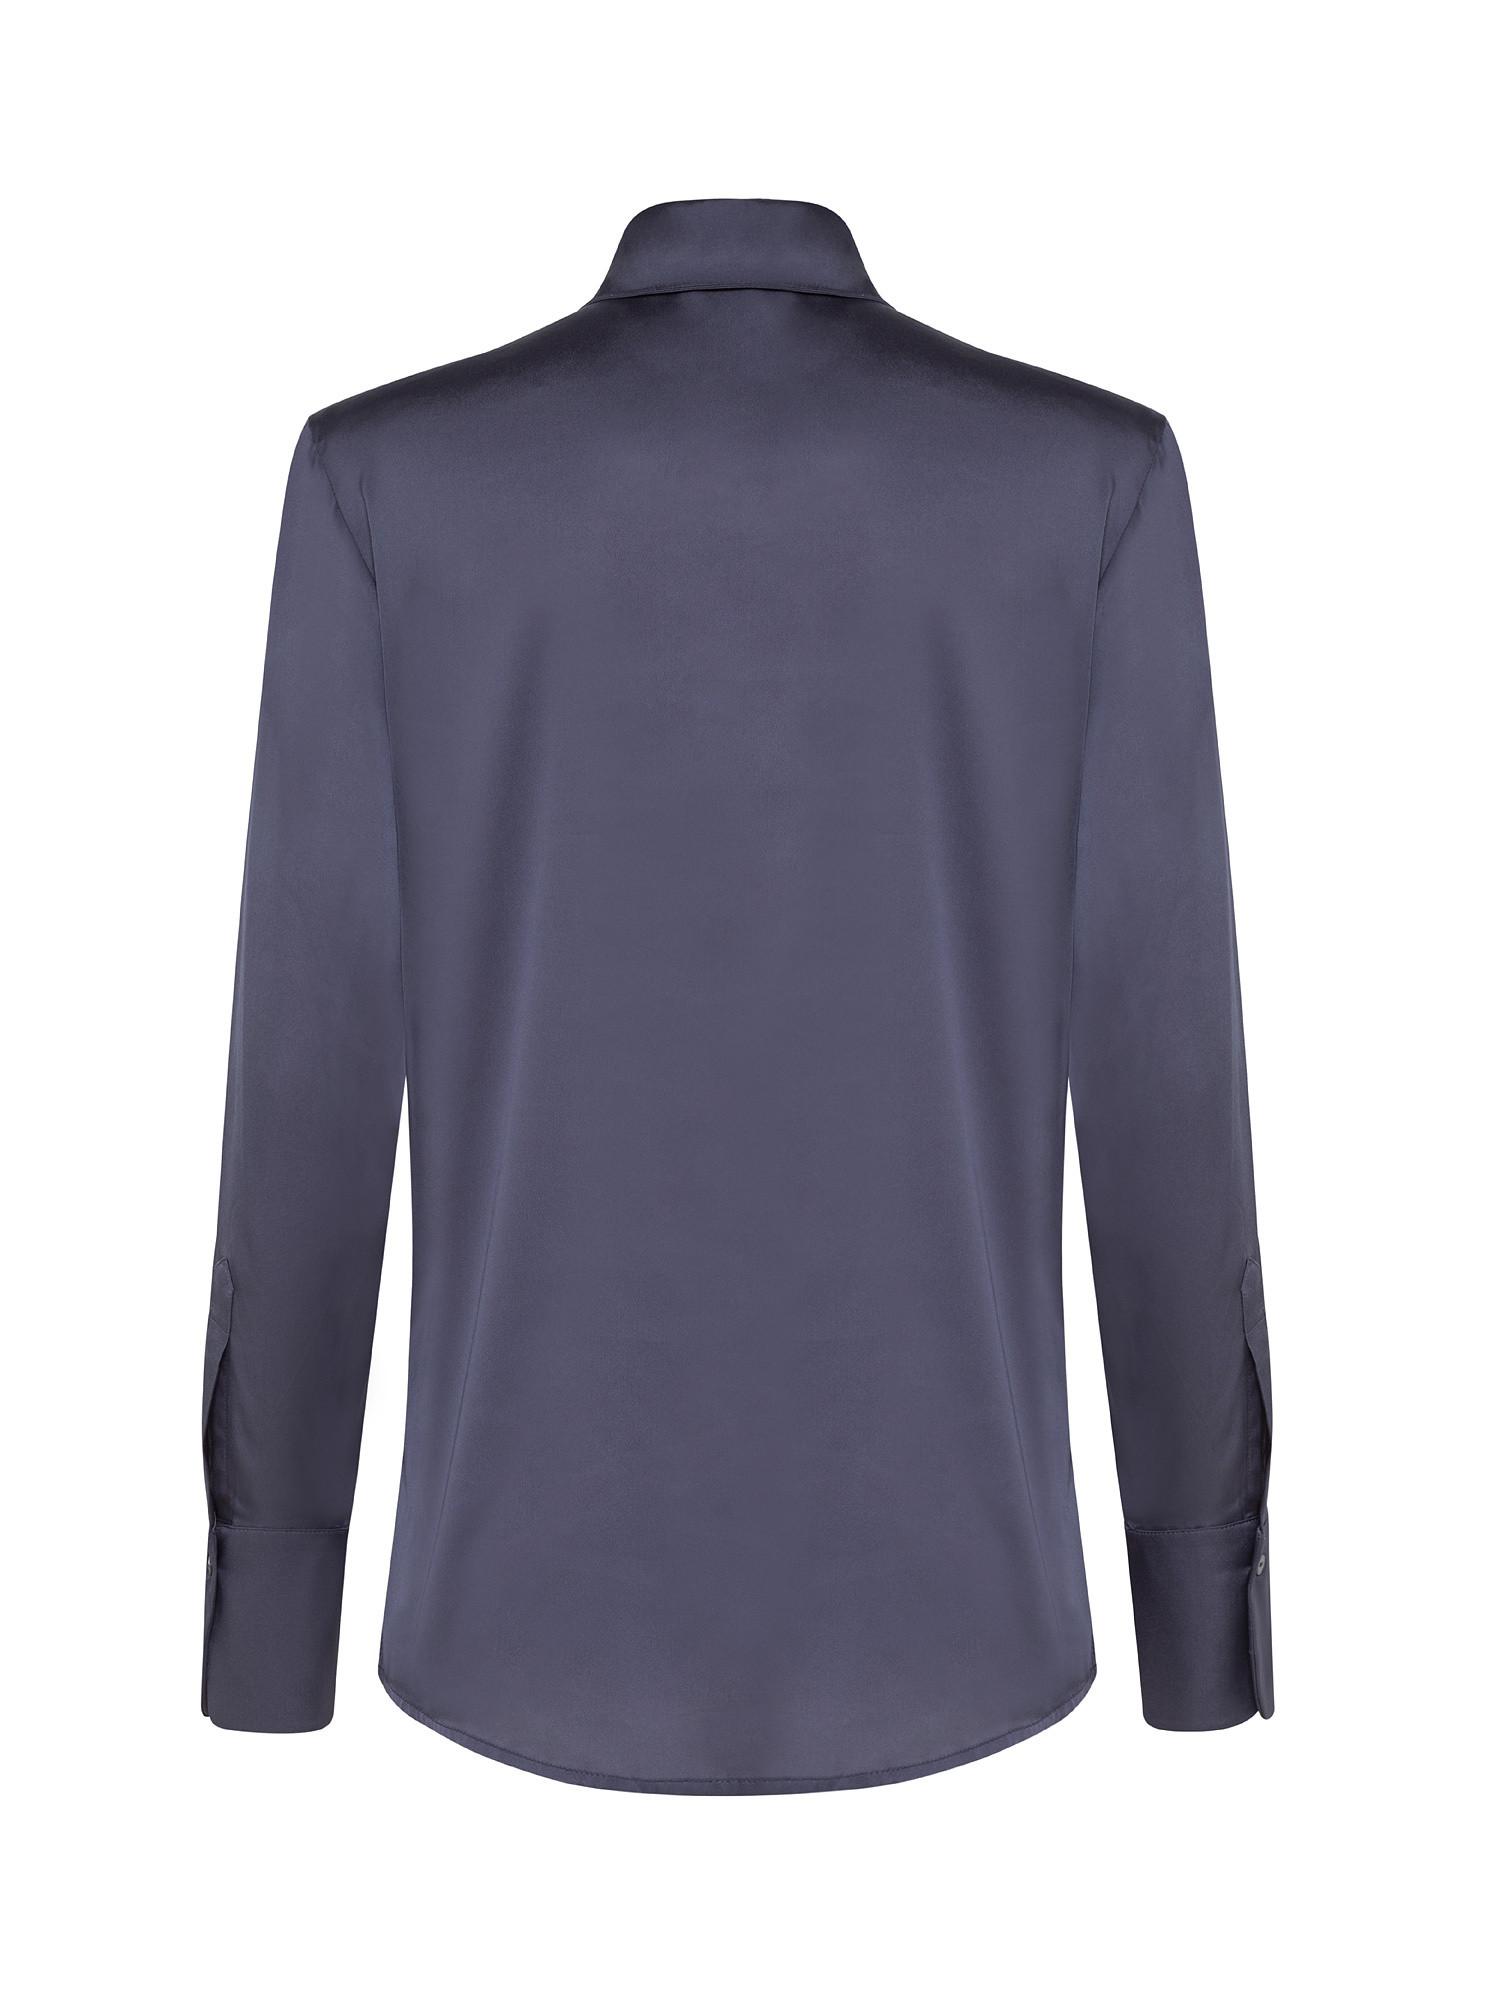 Camicia in viscosa seta stretch, Grigio, large image number 1